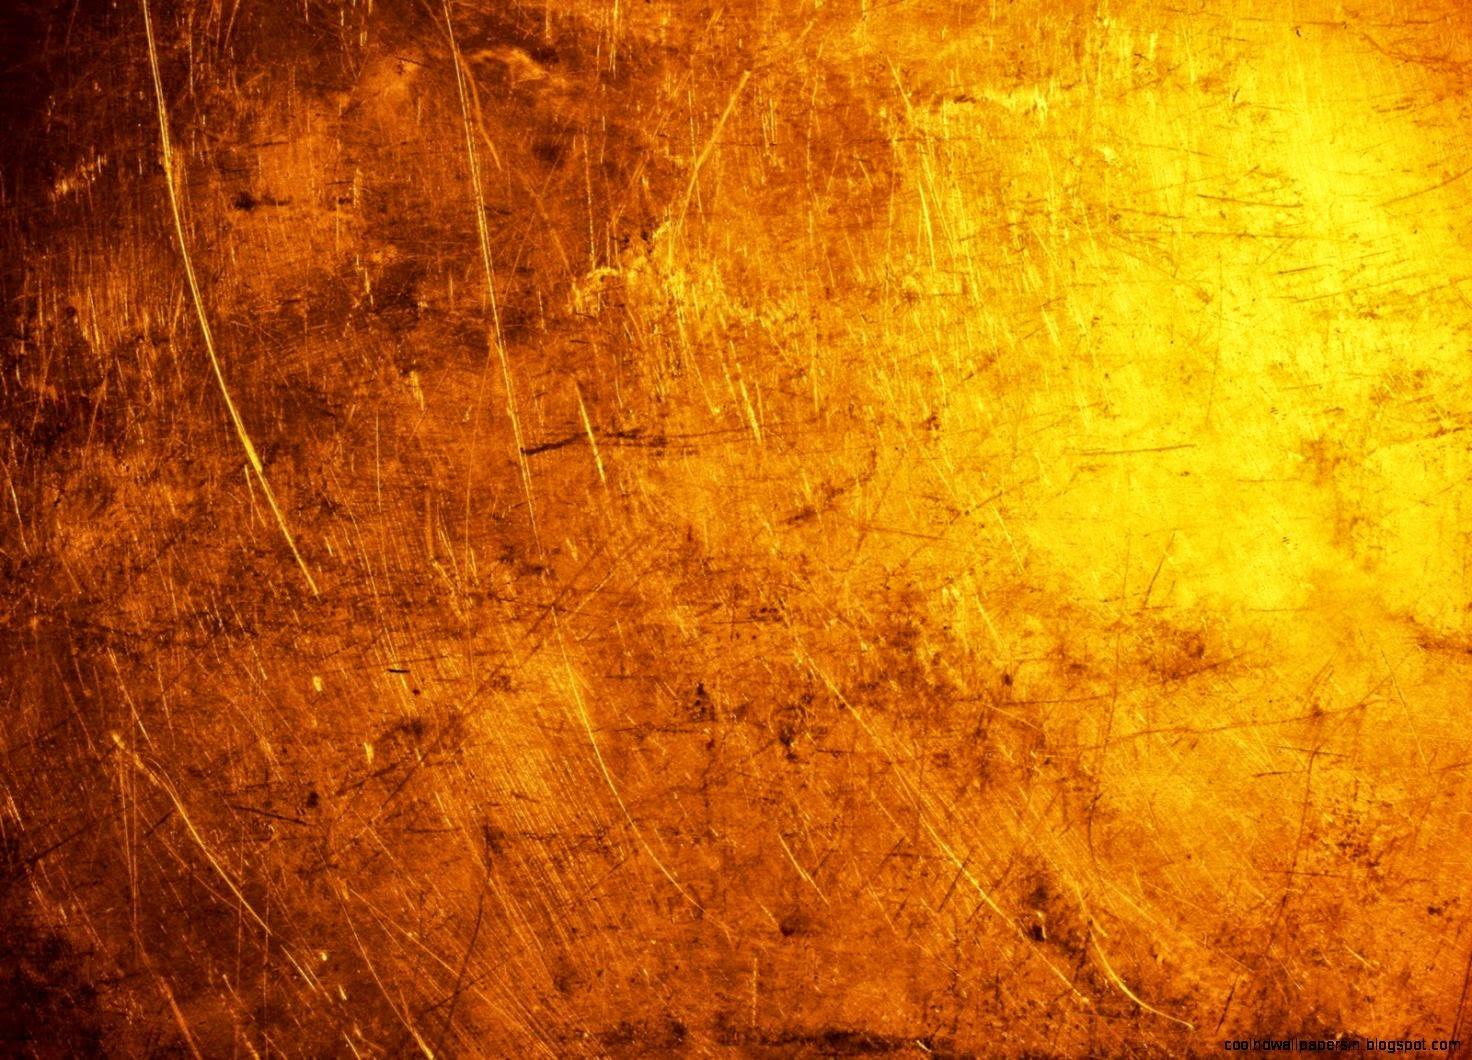 Gold Textured Wallpaper | Cool HD Wallpapers